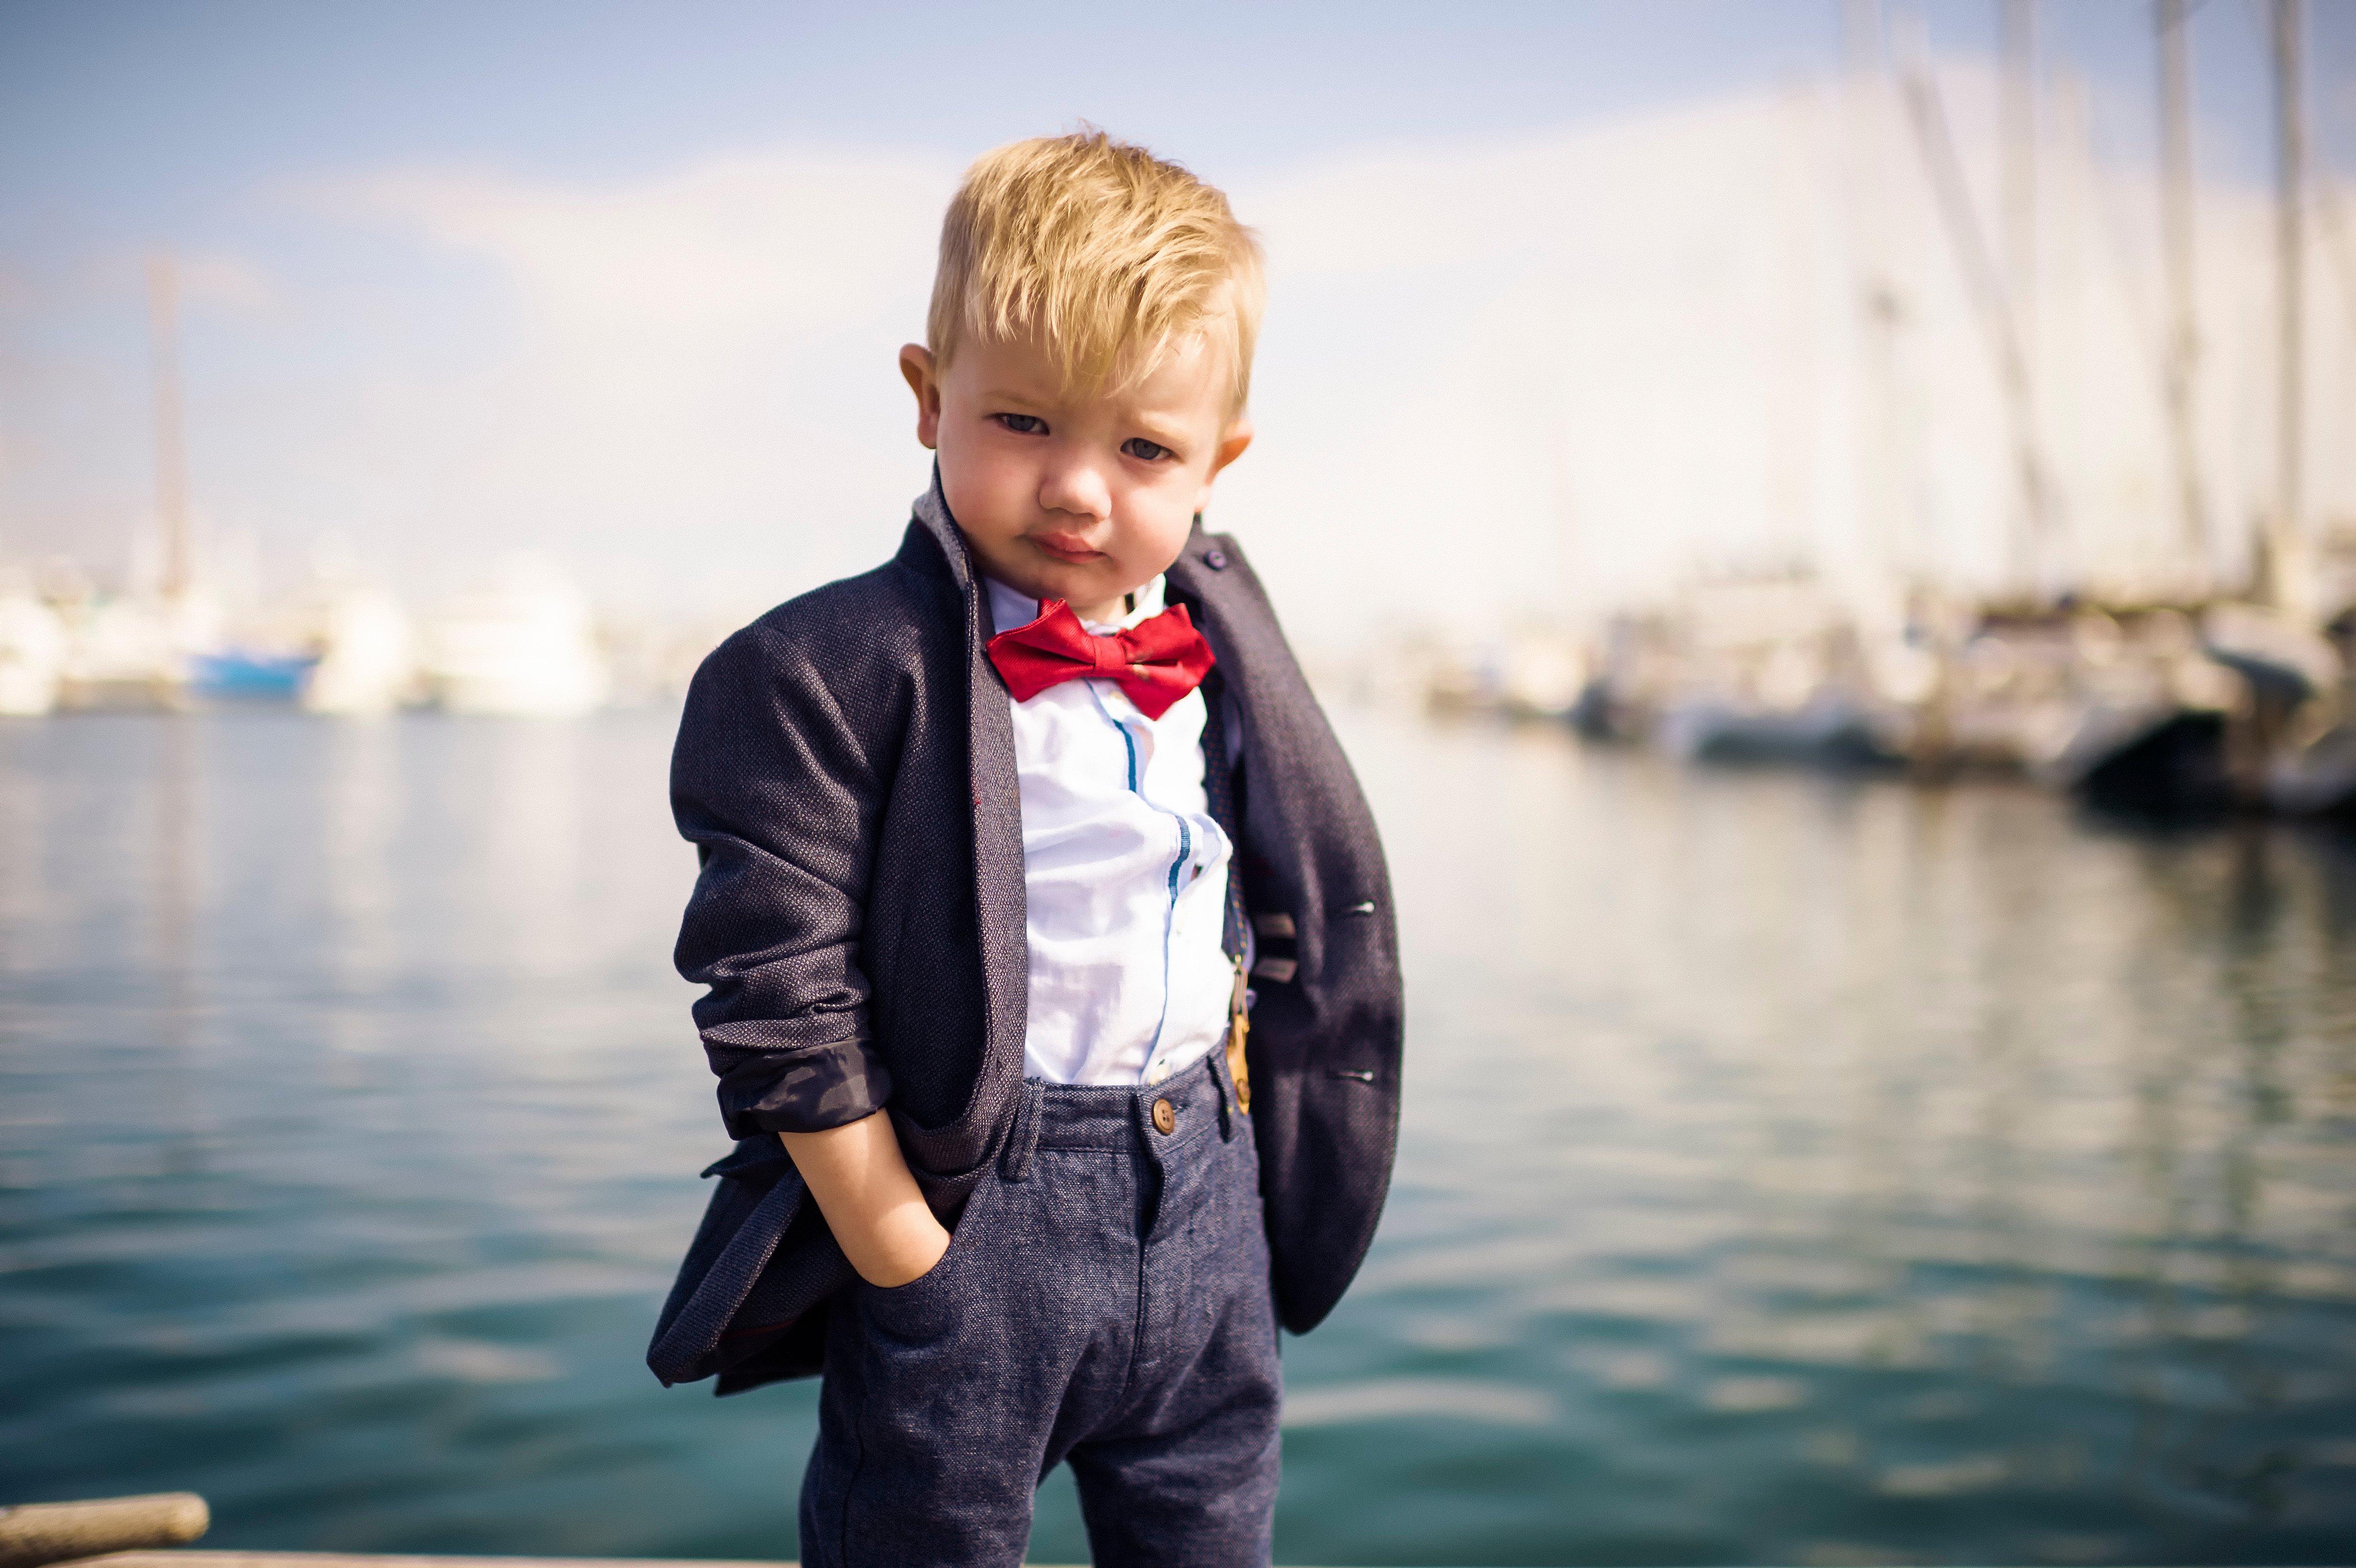 Juvenile Law Child Custody Family Law Criminal Defense